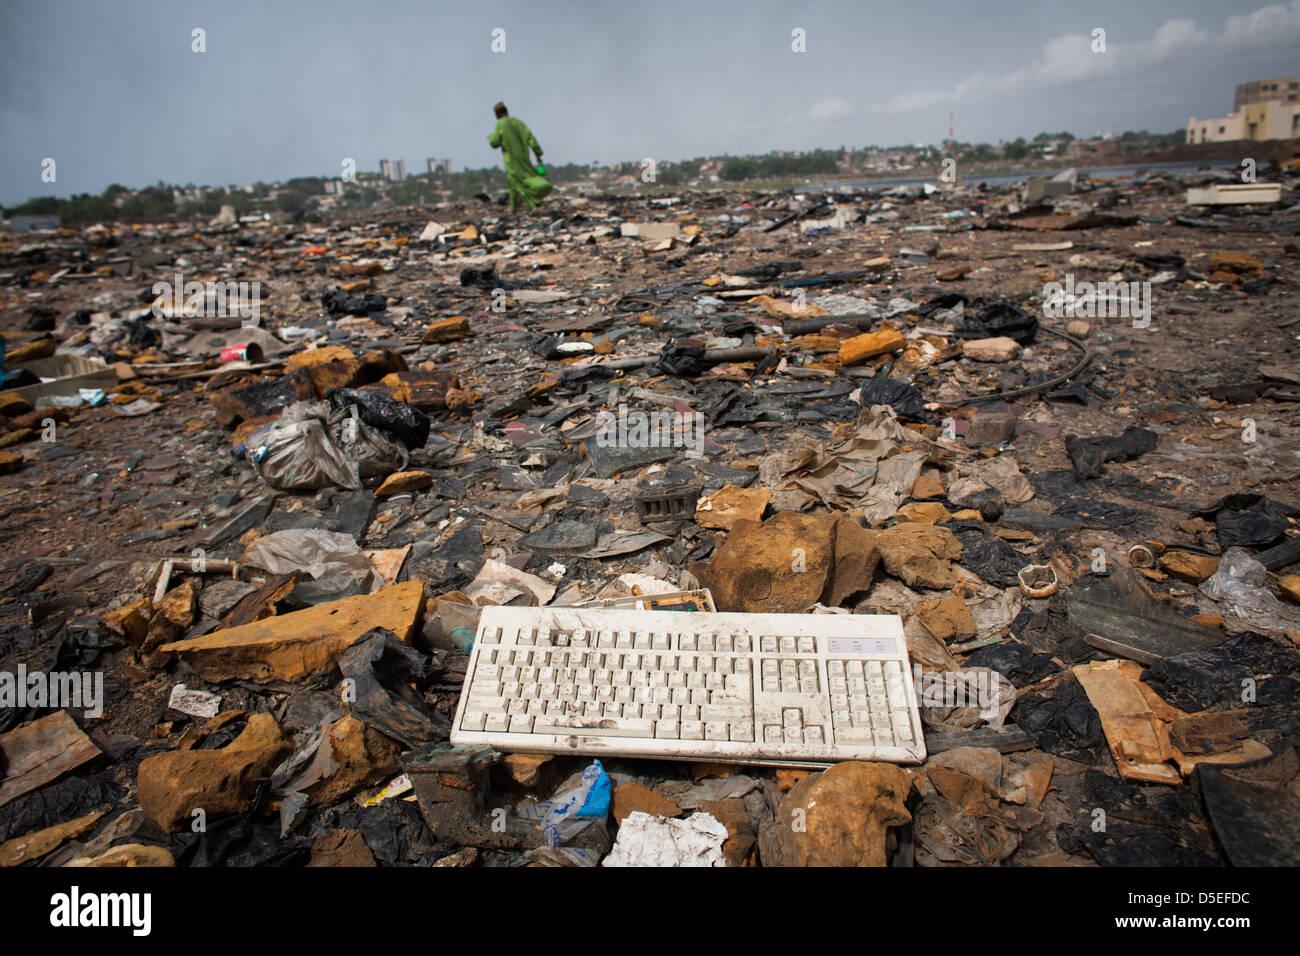 E-Schrott in Agbogbloshie Dump, Accra, Ghana. Stockbild